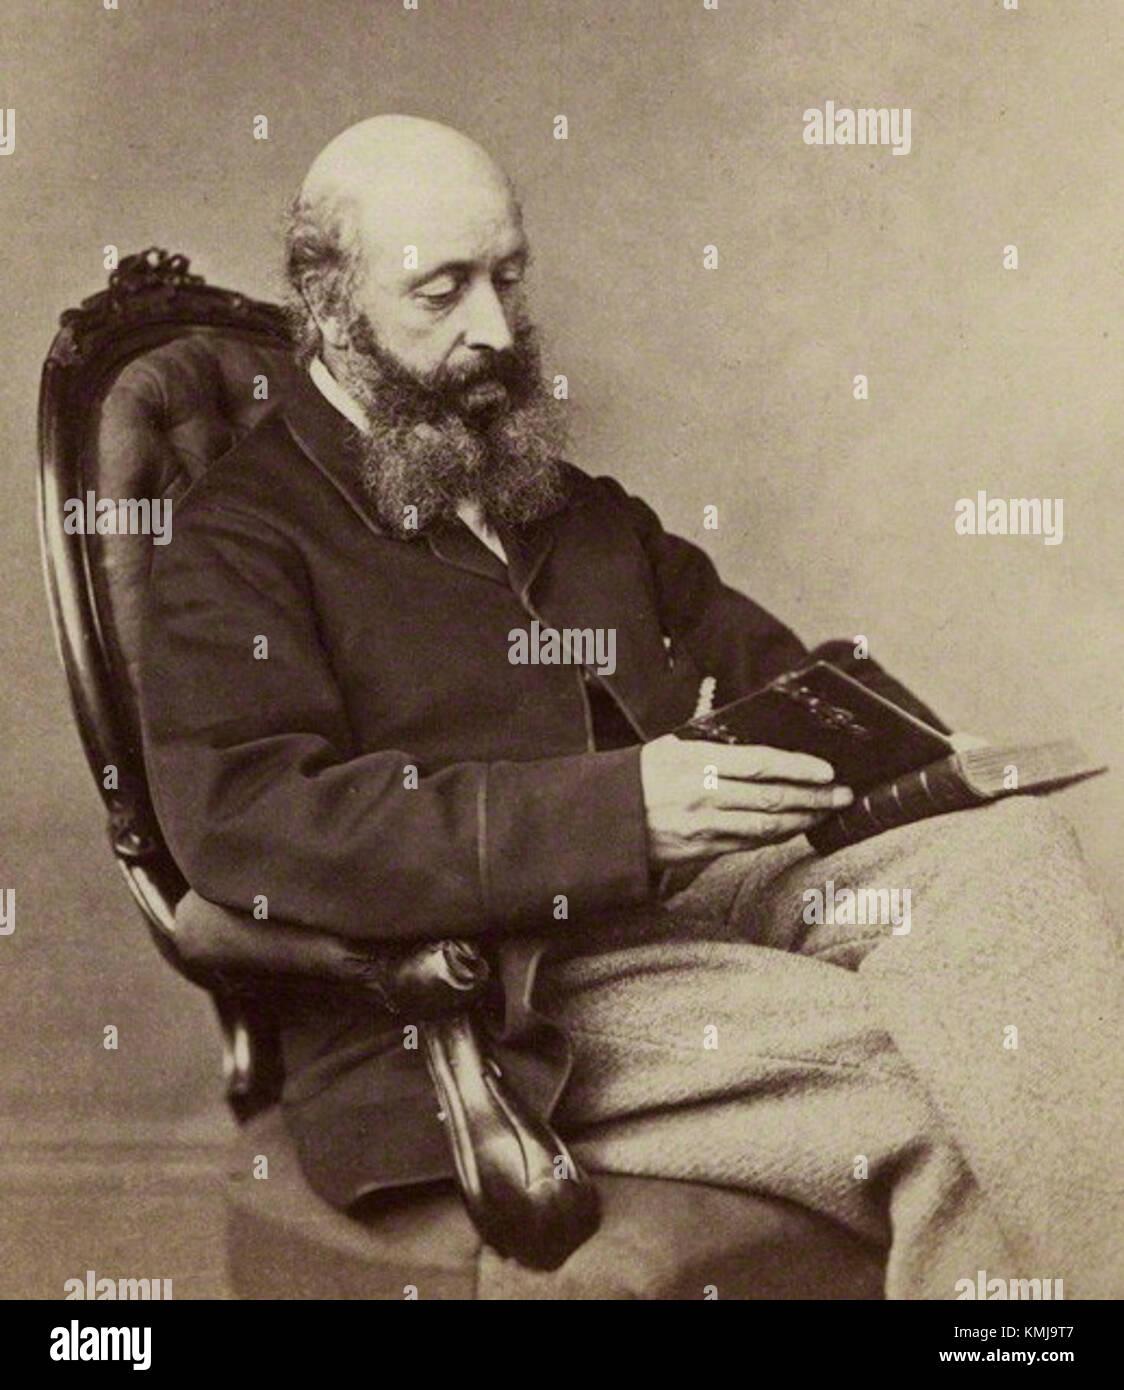 George Arthur fripp Photo Stock